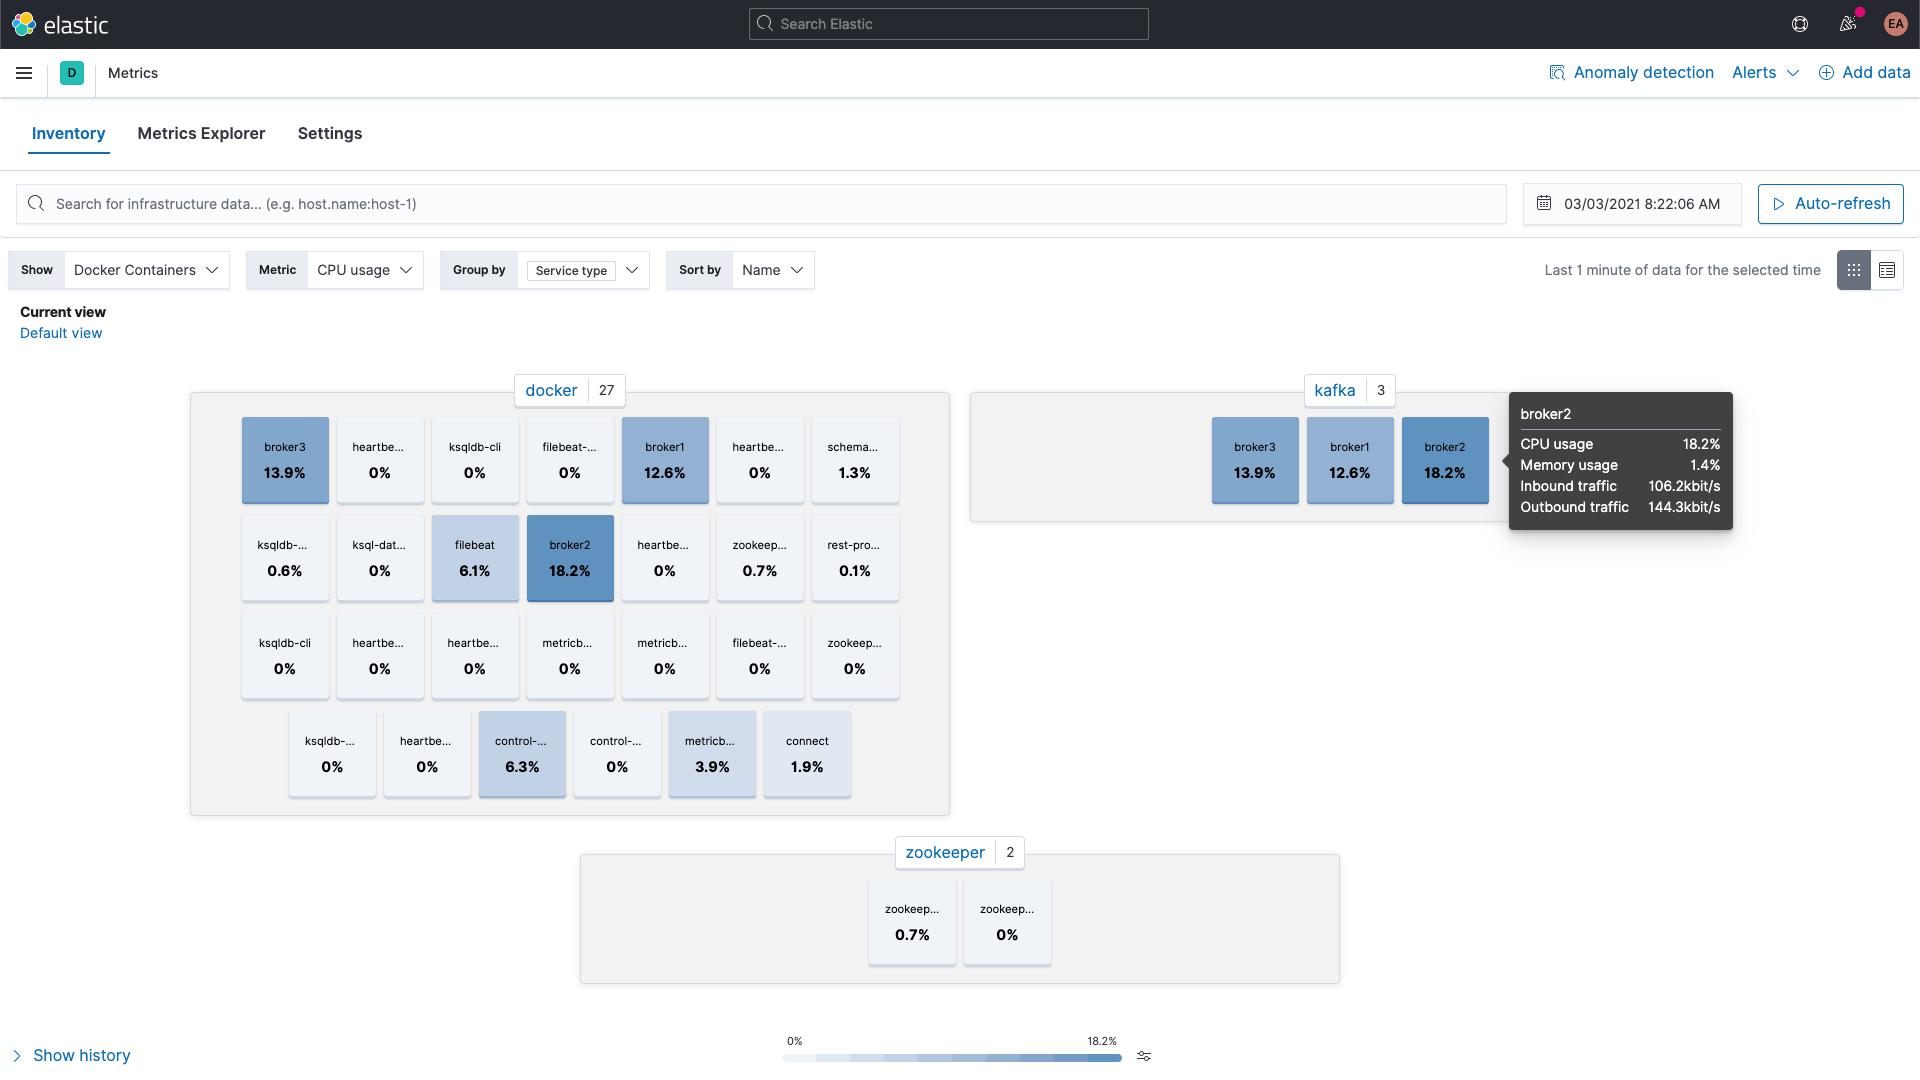 metrics-explorer-by-service.png